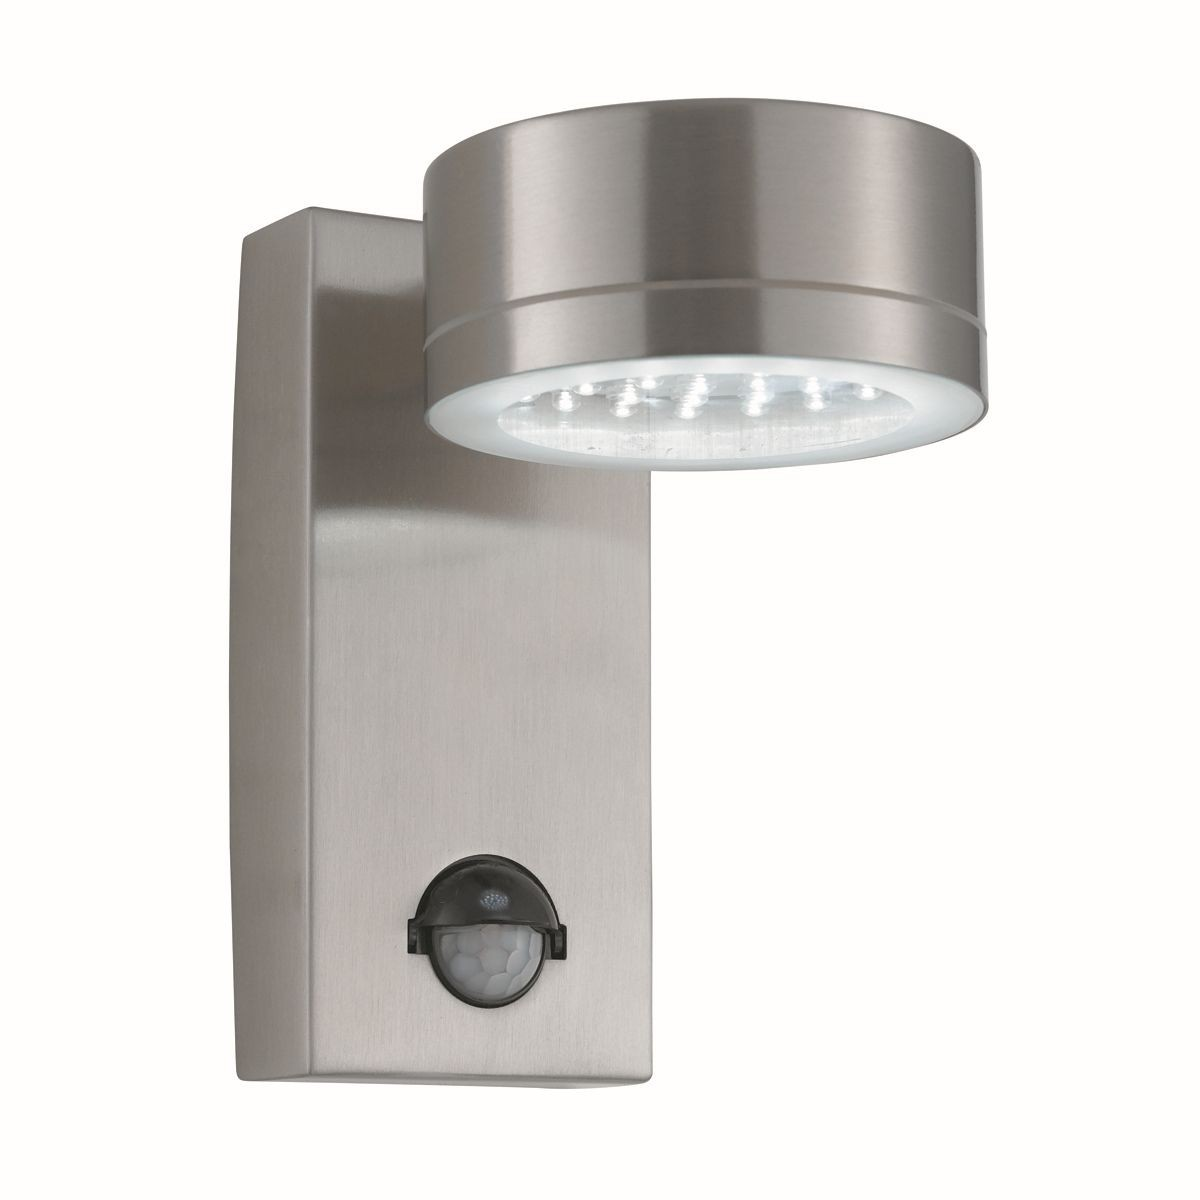 Outdoor led wall light motion sensor